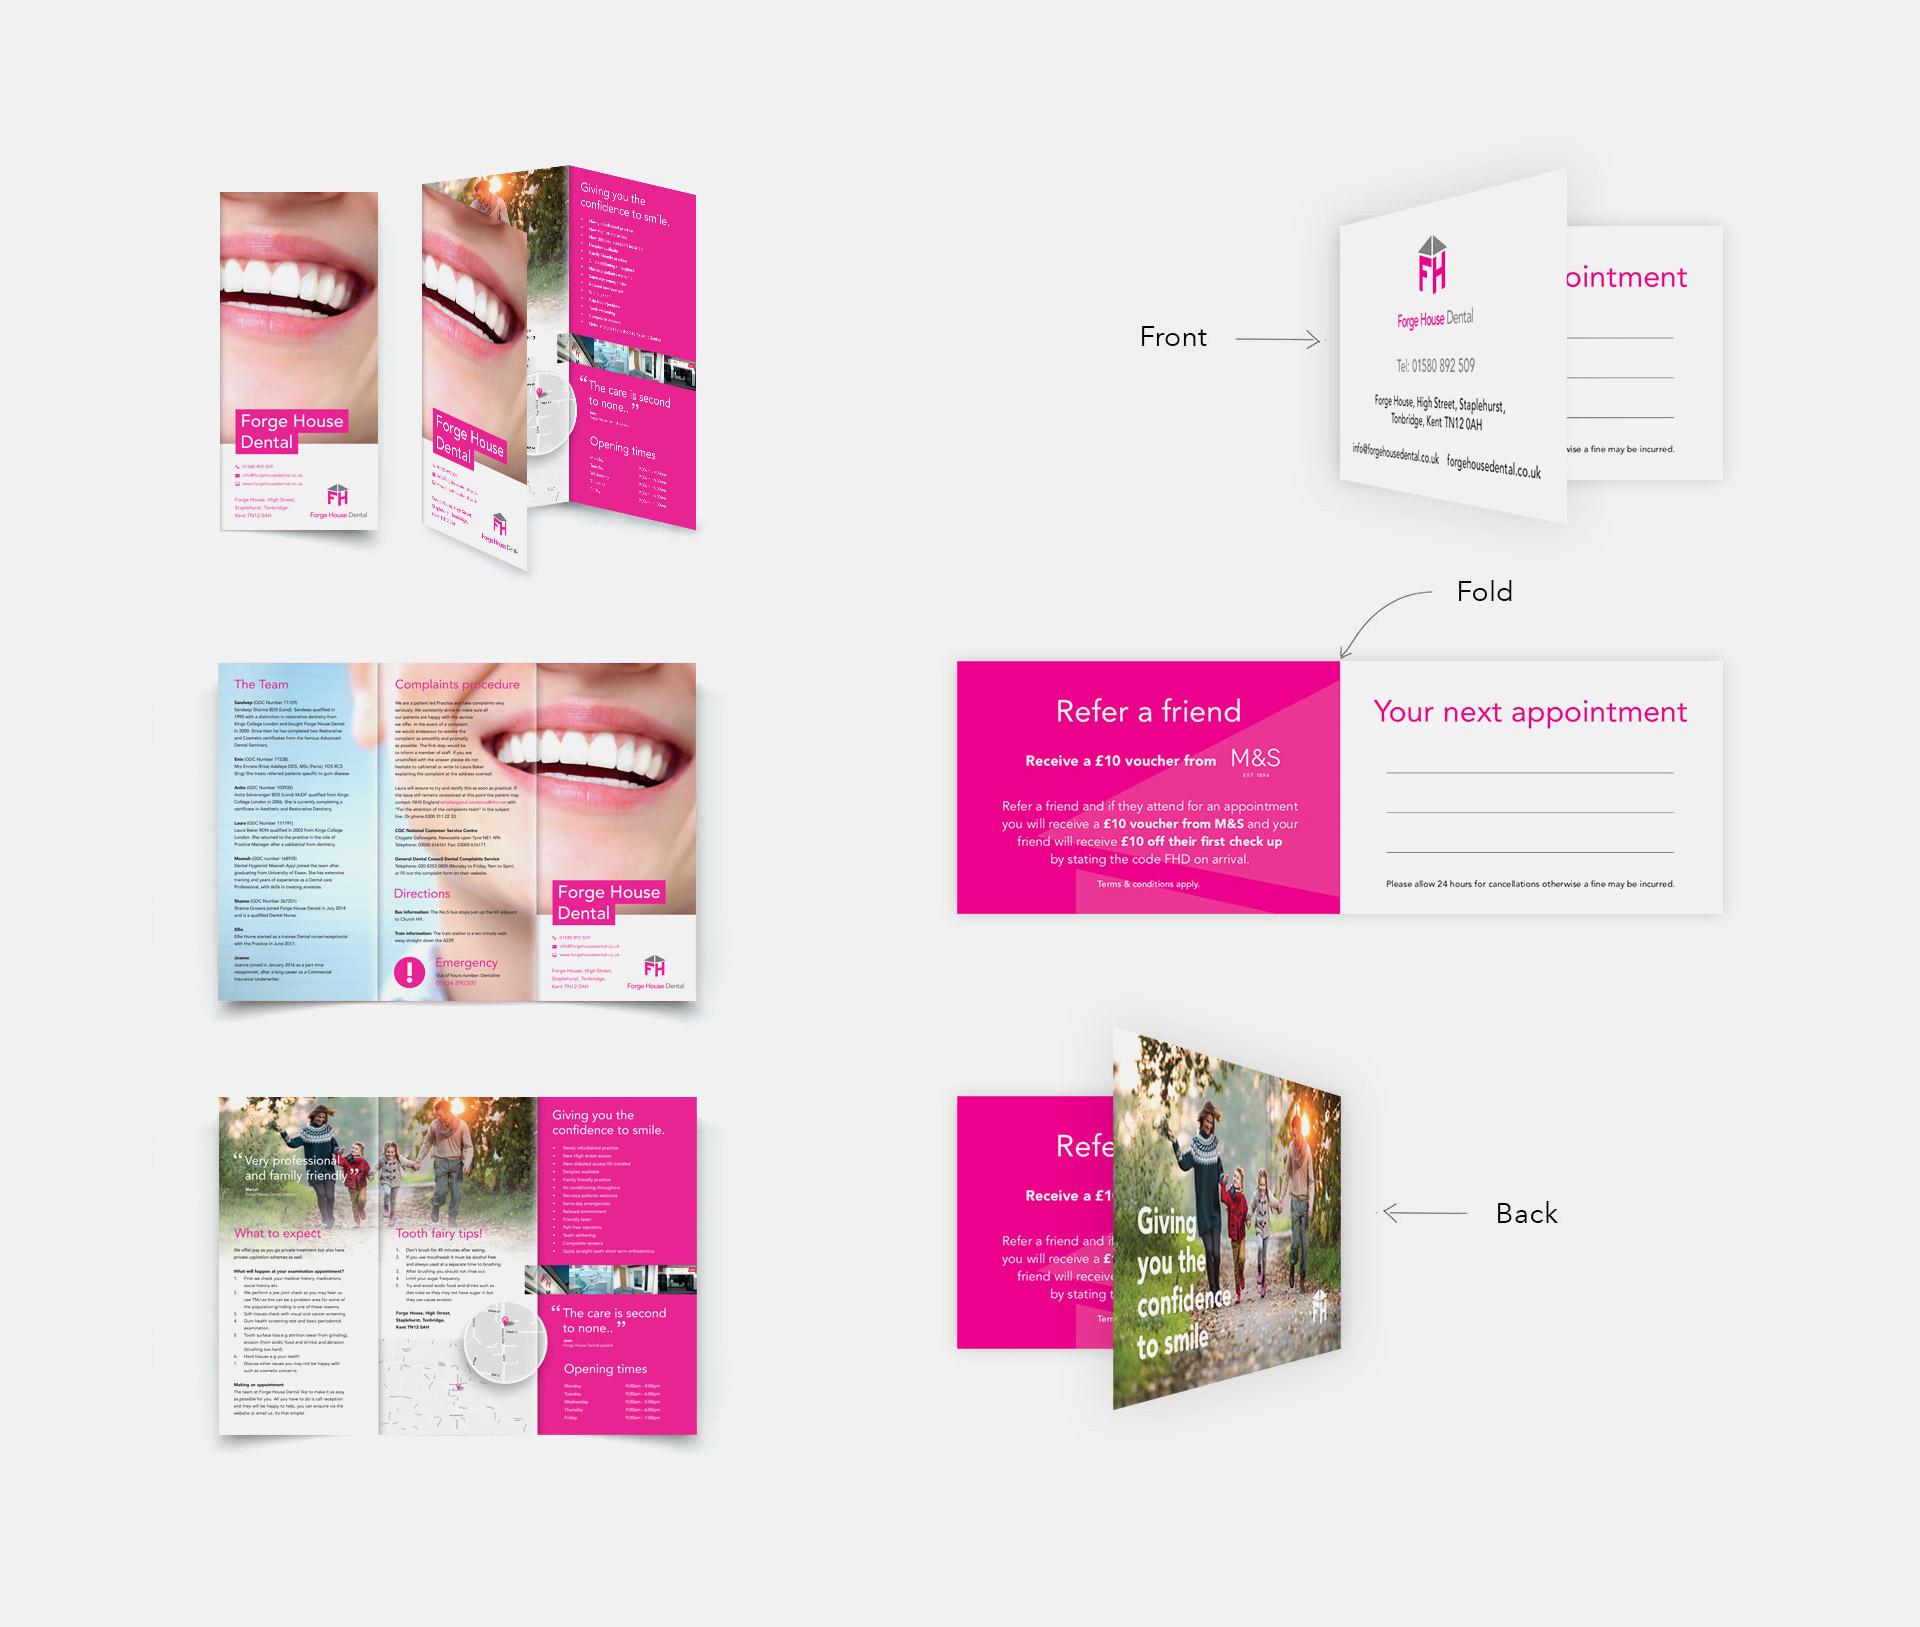 Forge House Dental Print